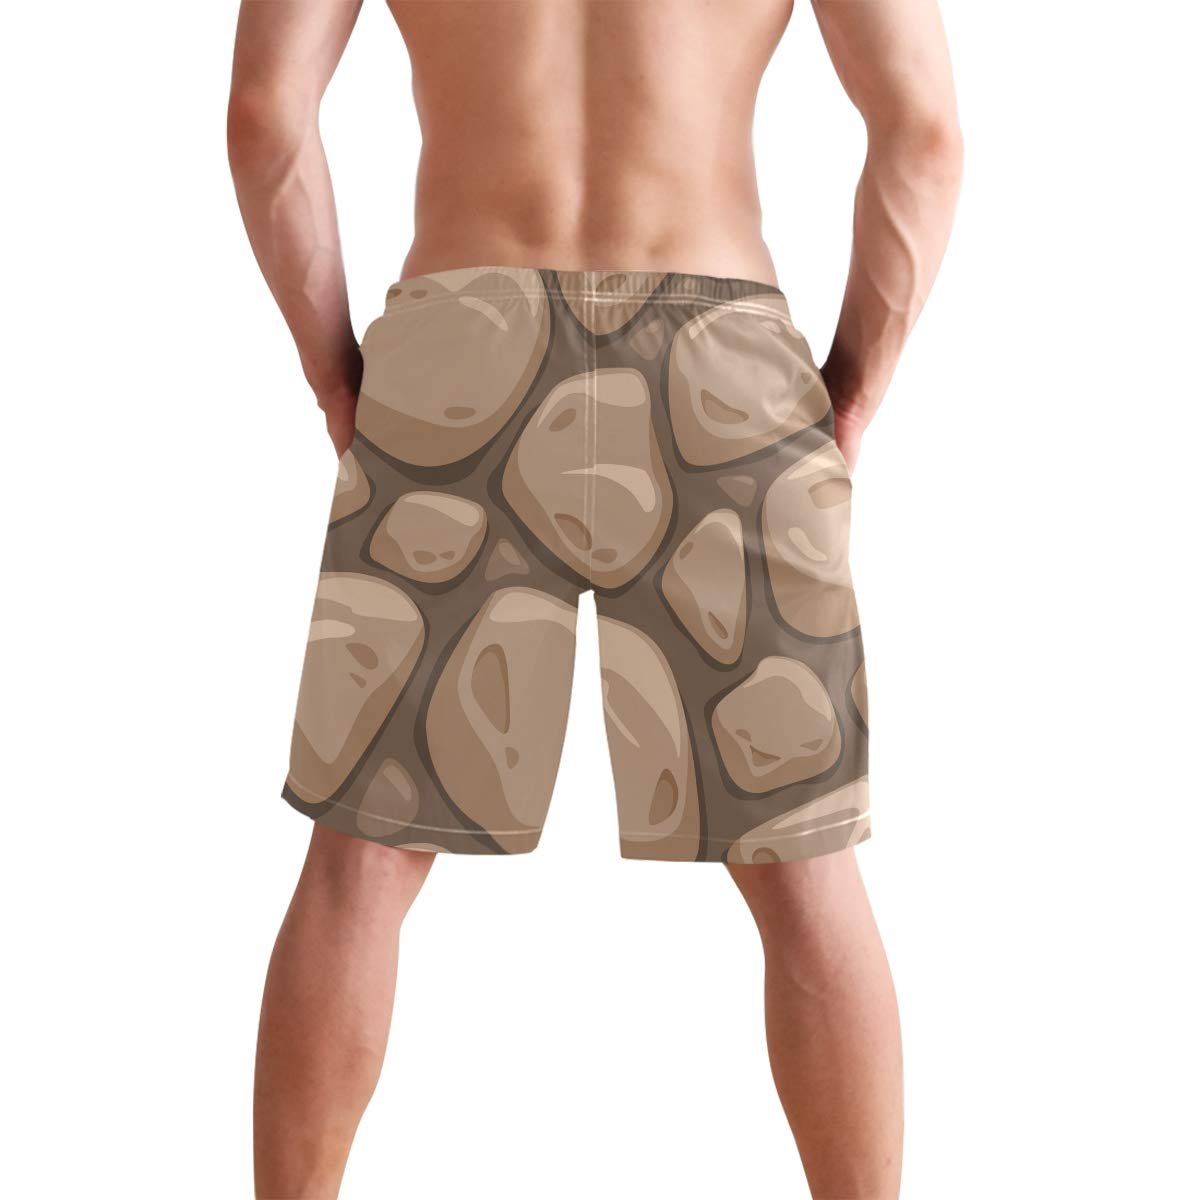 CiCily Men/'s Swim Trunks Pebbles Beach Board Shorts Swimming Short Pants Running Sports Surffing Shorts